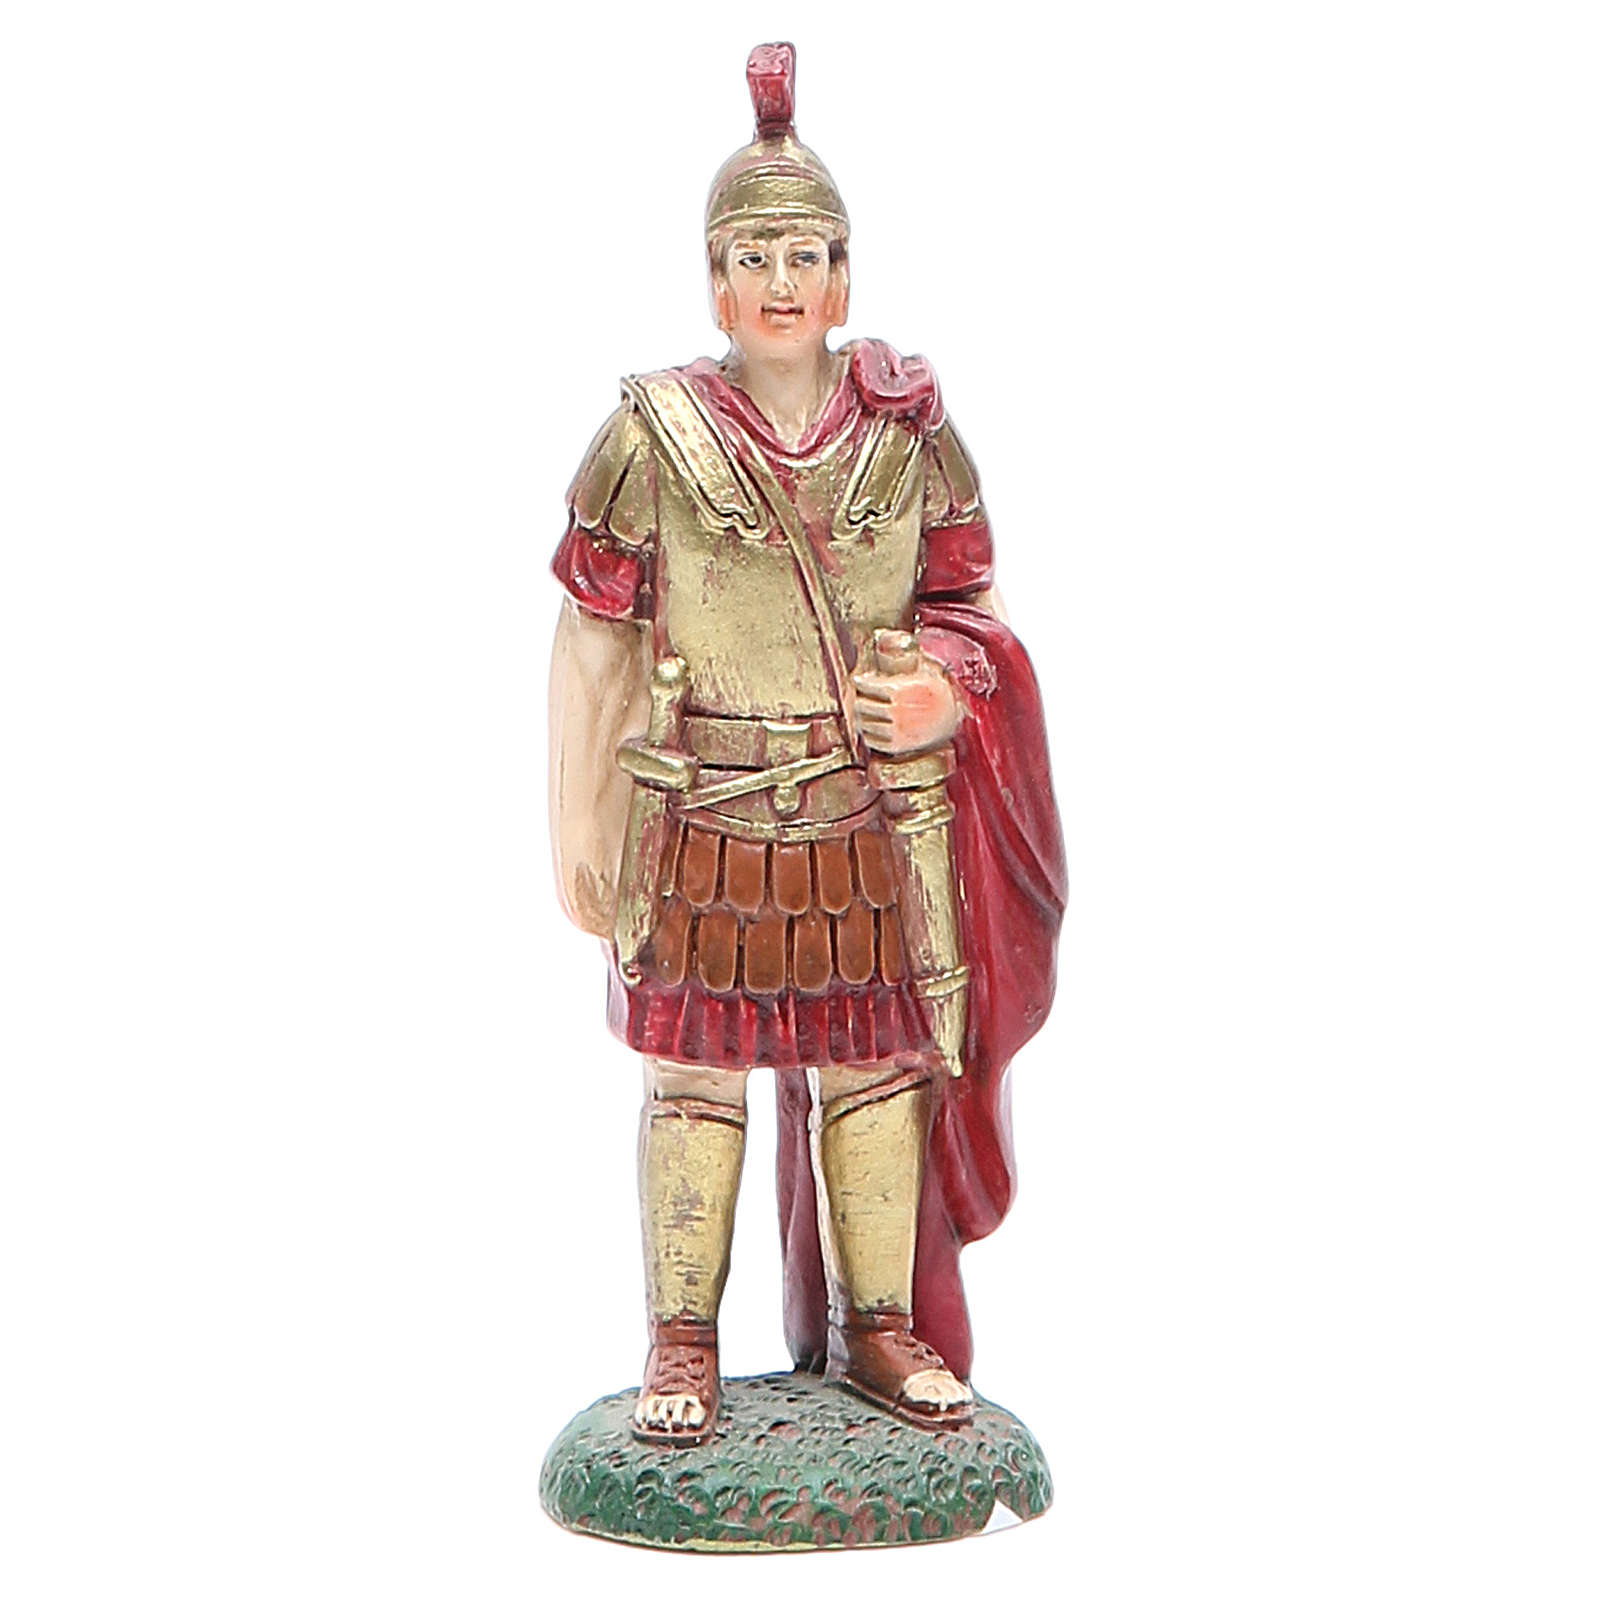 Soldato romano 10 cm Linea Martino Landi 3